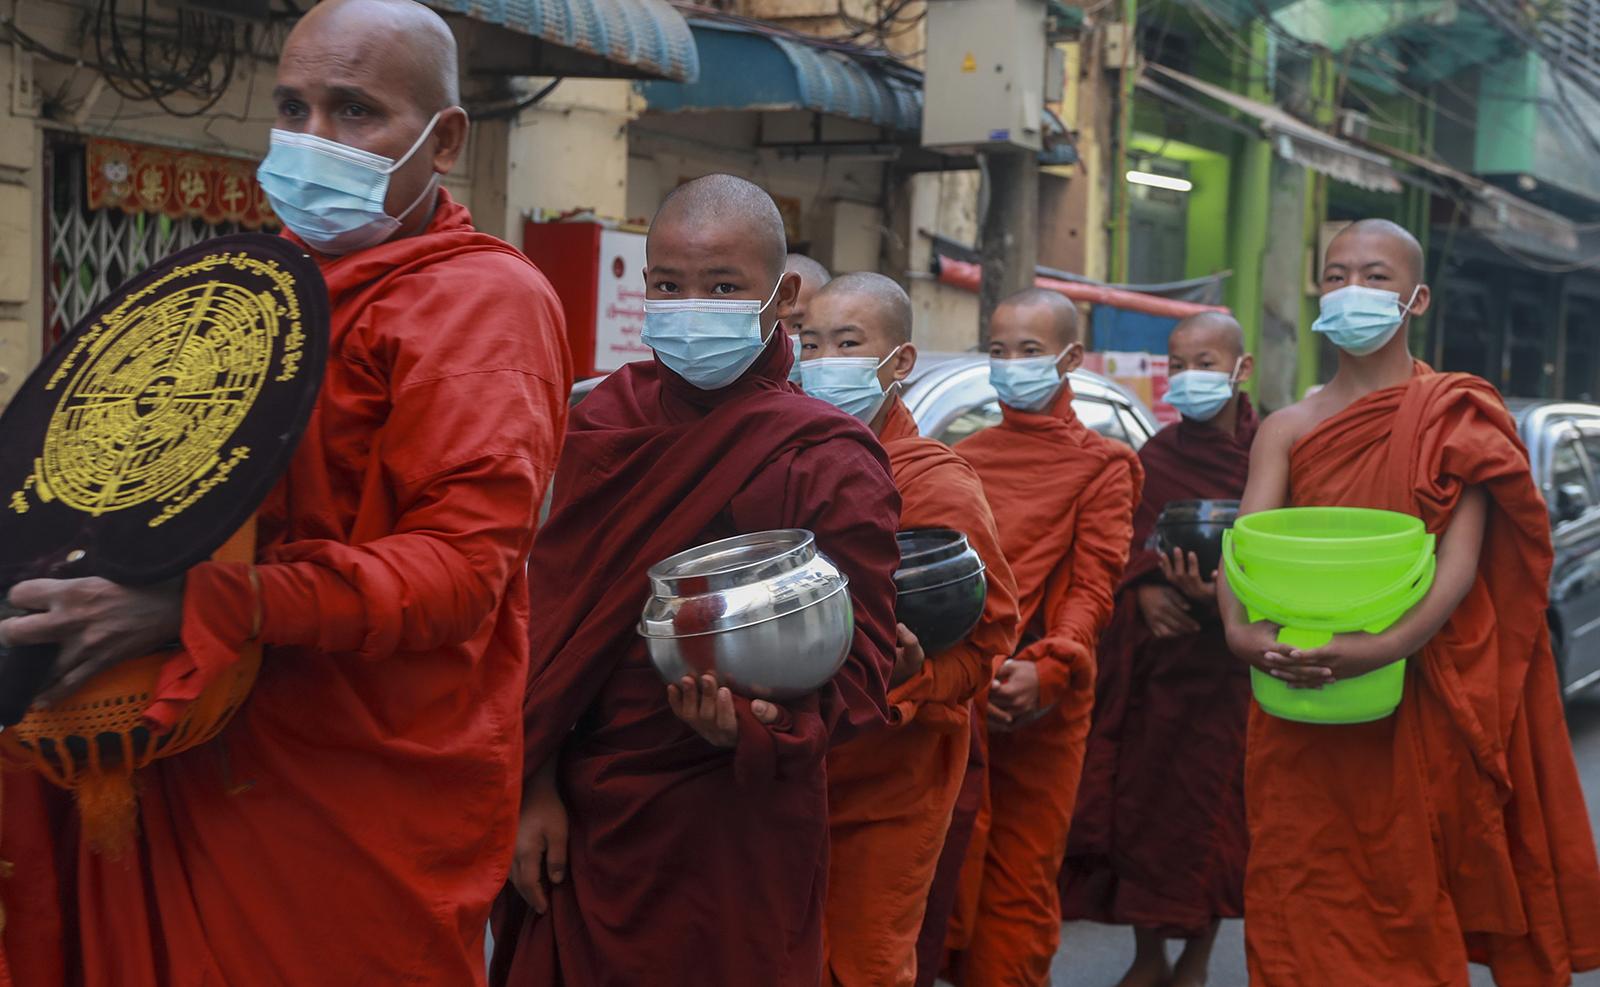 Buddhist monks walk begging for alms in Yangon, Myanmar, Tuesday, Feb. 2, 2021. AP